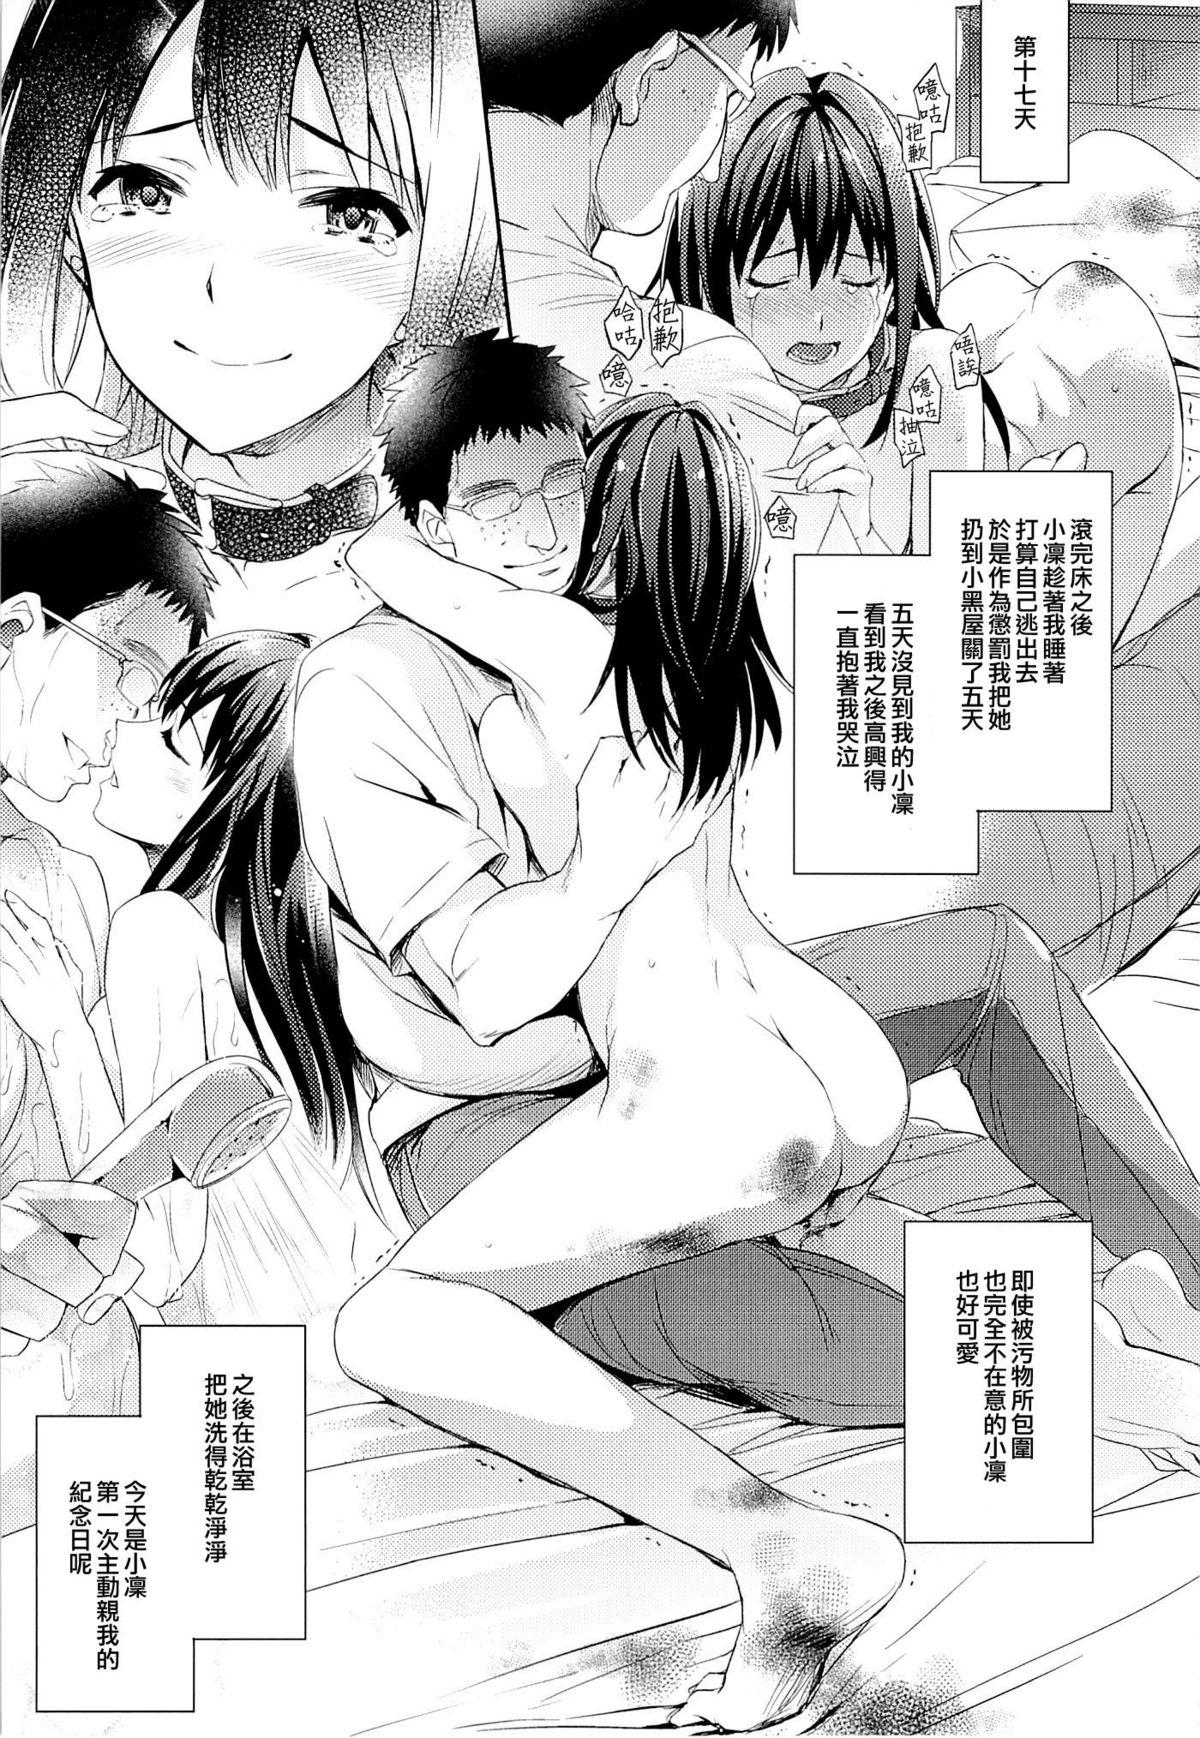 (COMIC1☆9) [Crazy9 (Ichitaka)] C9-18 Shiburin Kankin 30-nichi (THE IDOLM@STER CINDERELLA GIRLS) [Chinese] [CE家族社] 16